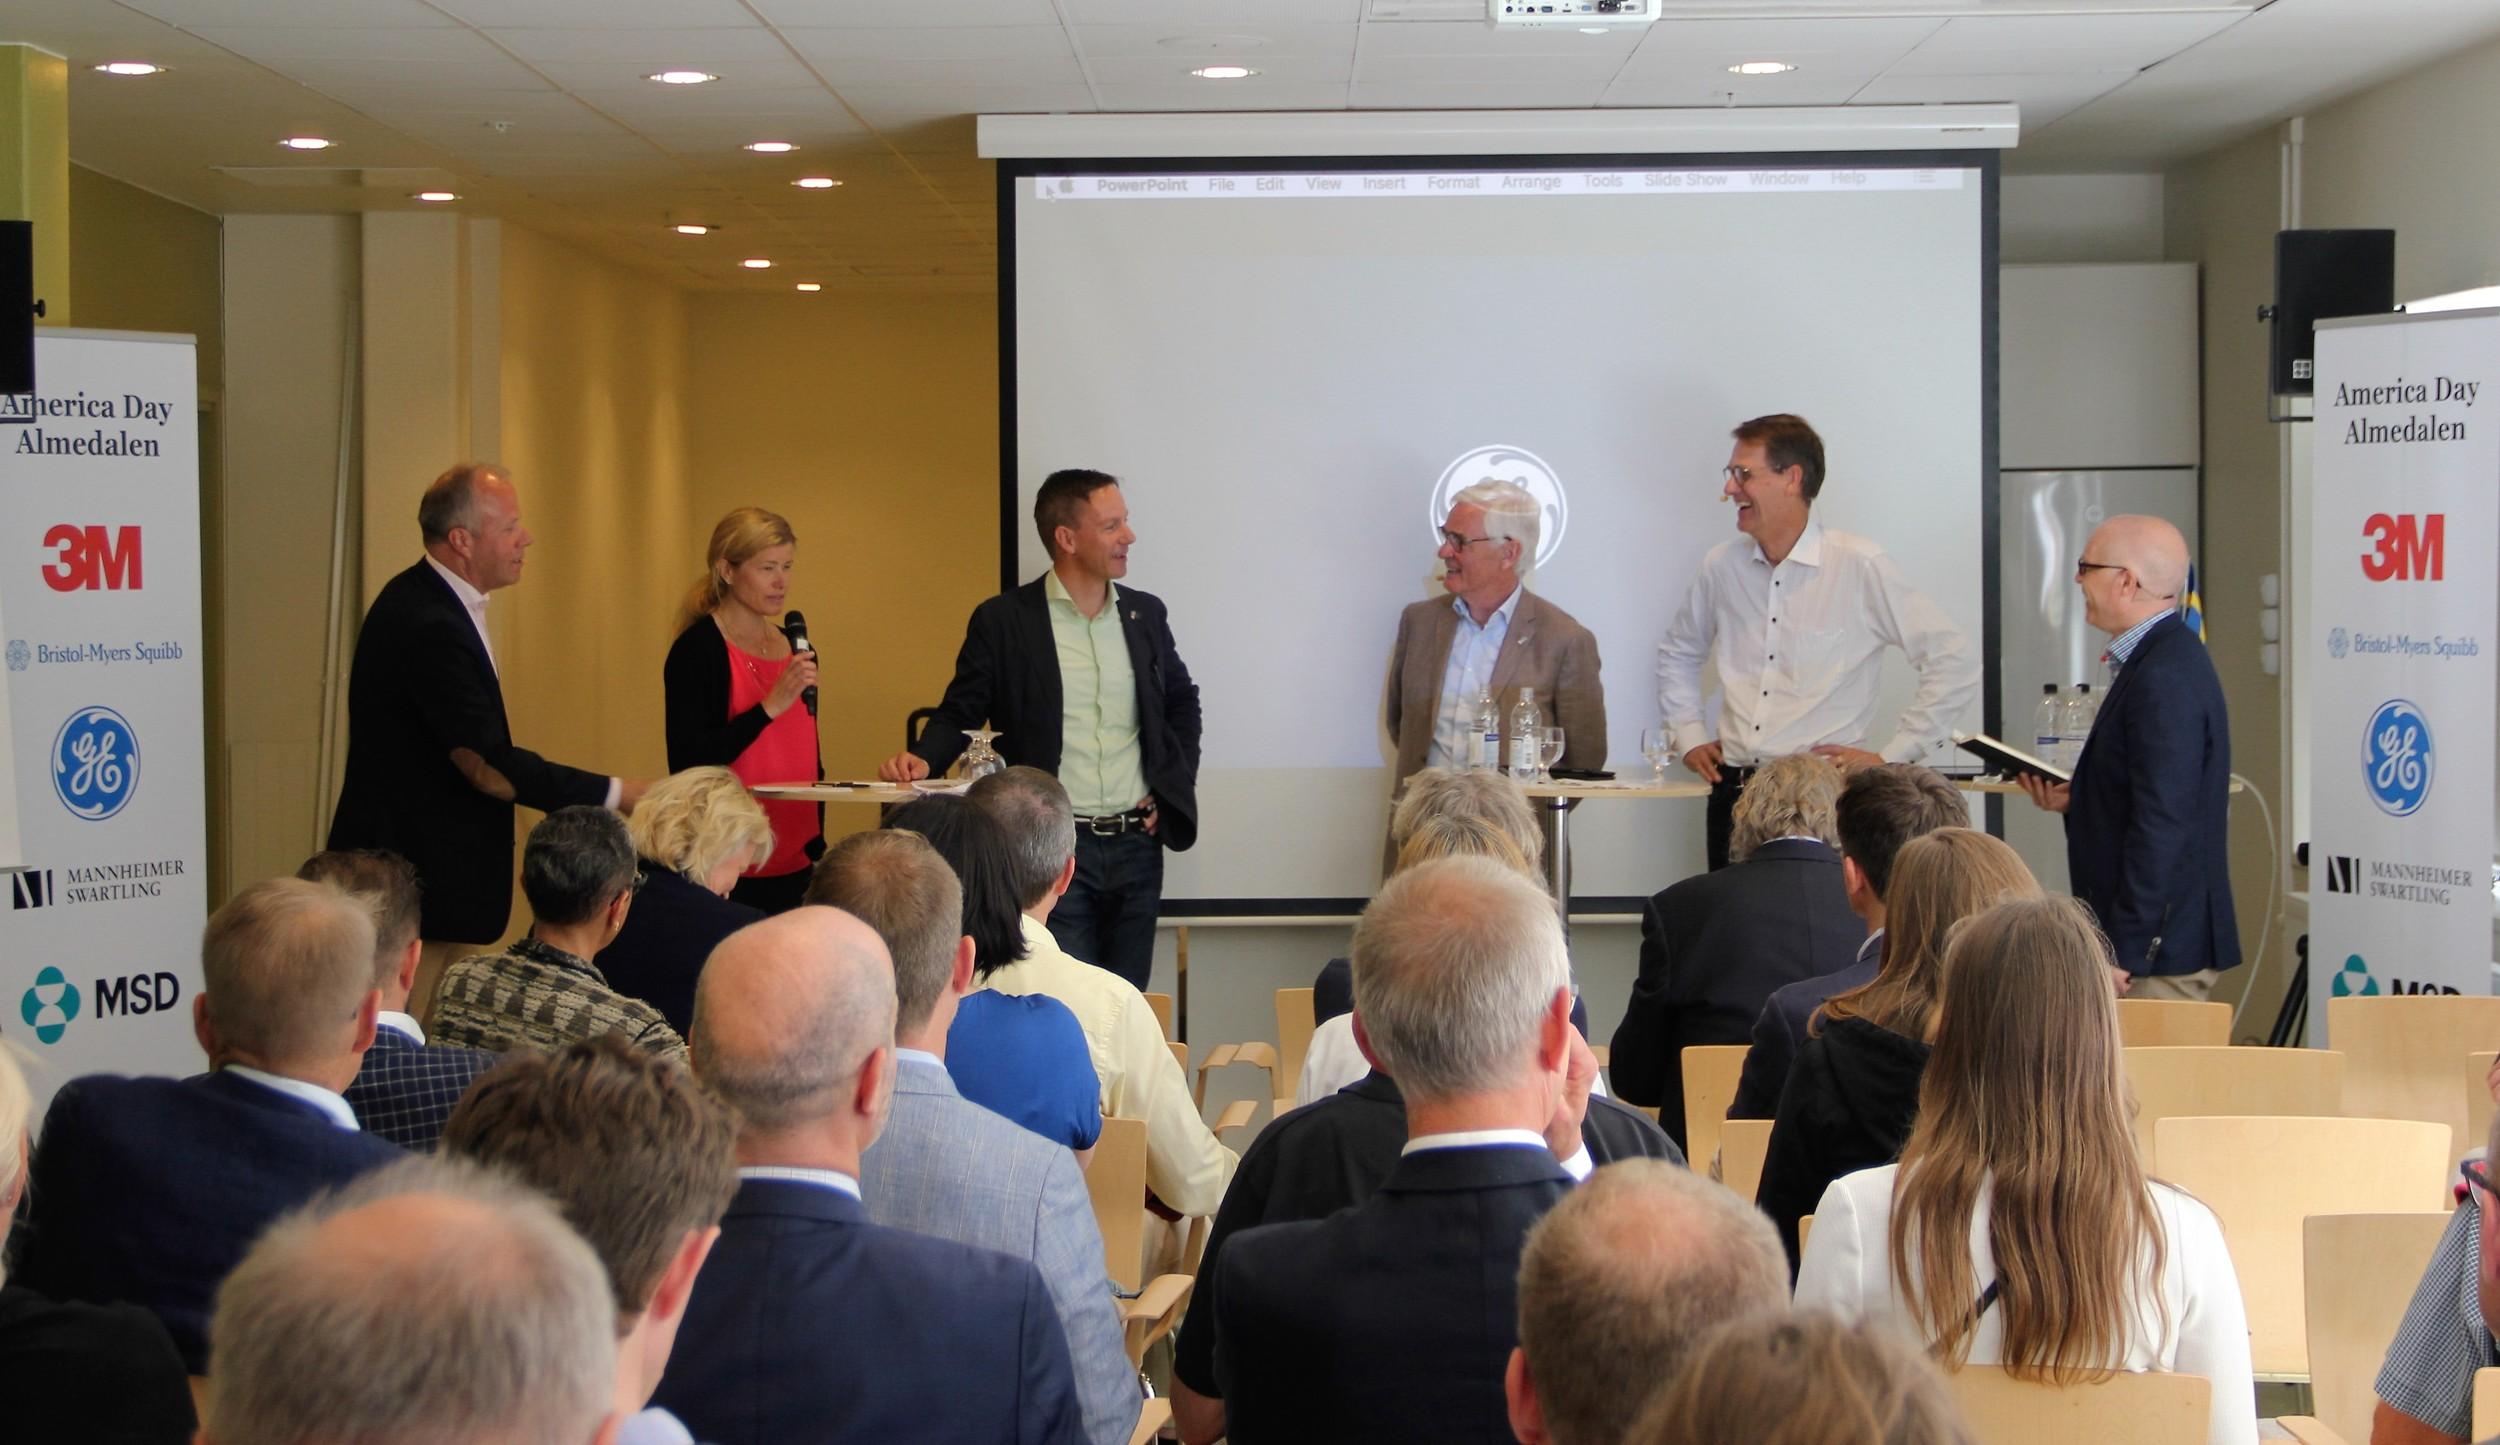 Pictured: Lars Näslund, 3M; Malin Parkler, Pfizer; Jacob Tellgren, MSD; Hans Enocson, GE; Martin Ingvar, Karolinska Institutet; Magnus Aronsson, ESBRI.   Amir Hefni, Bristol-Myers Squibb, arrived after this photo was taken.